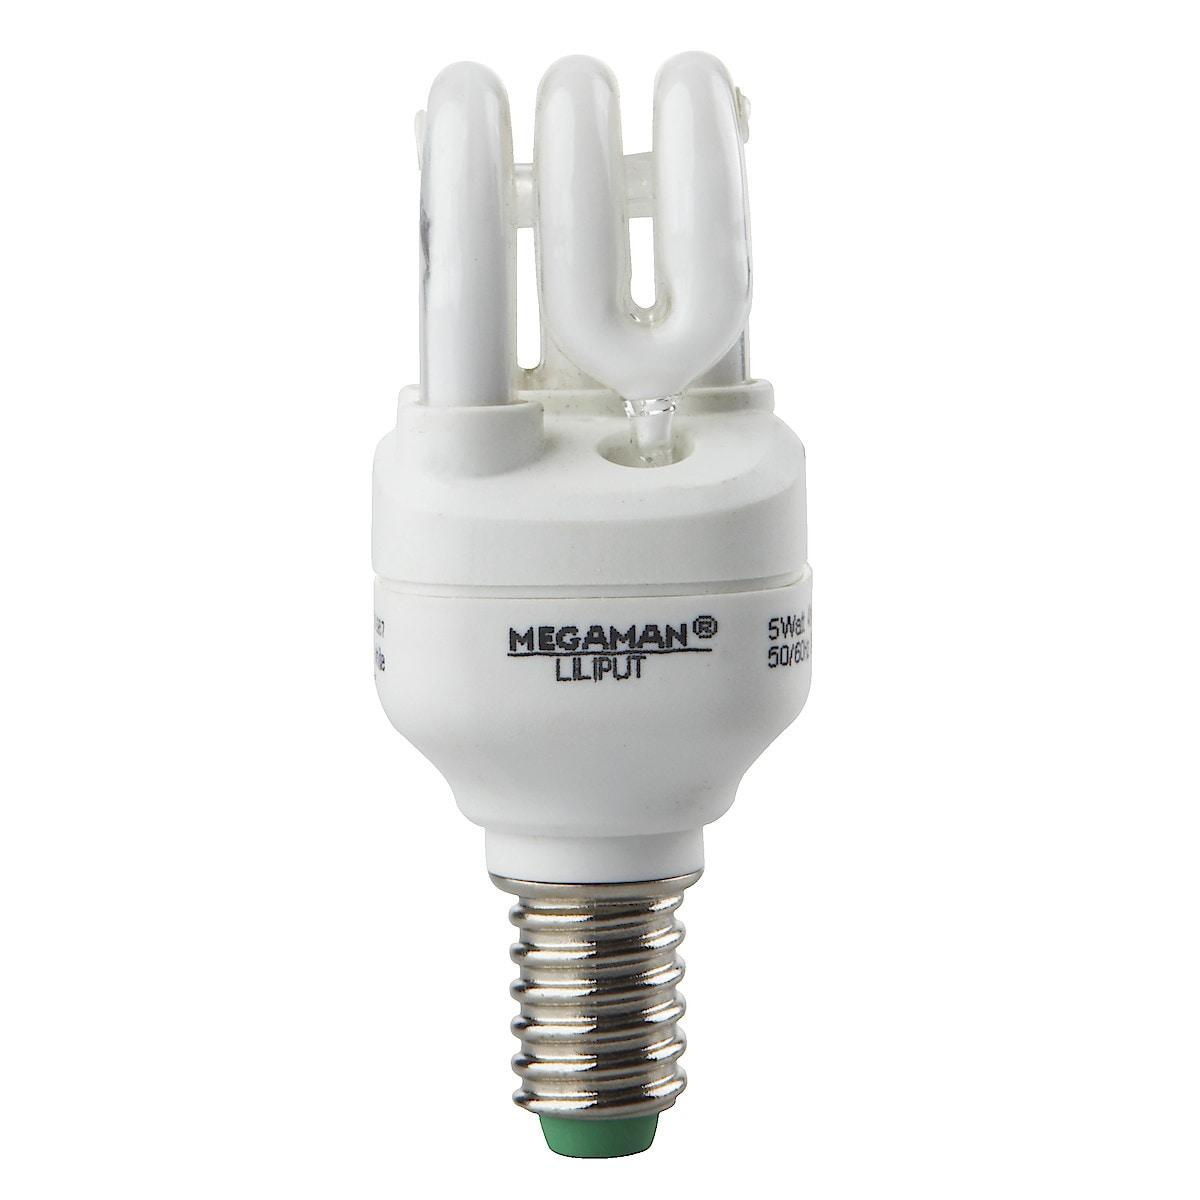 ENERGIALAMPPU 5W E14 MEGAMAN